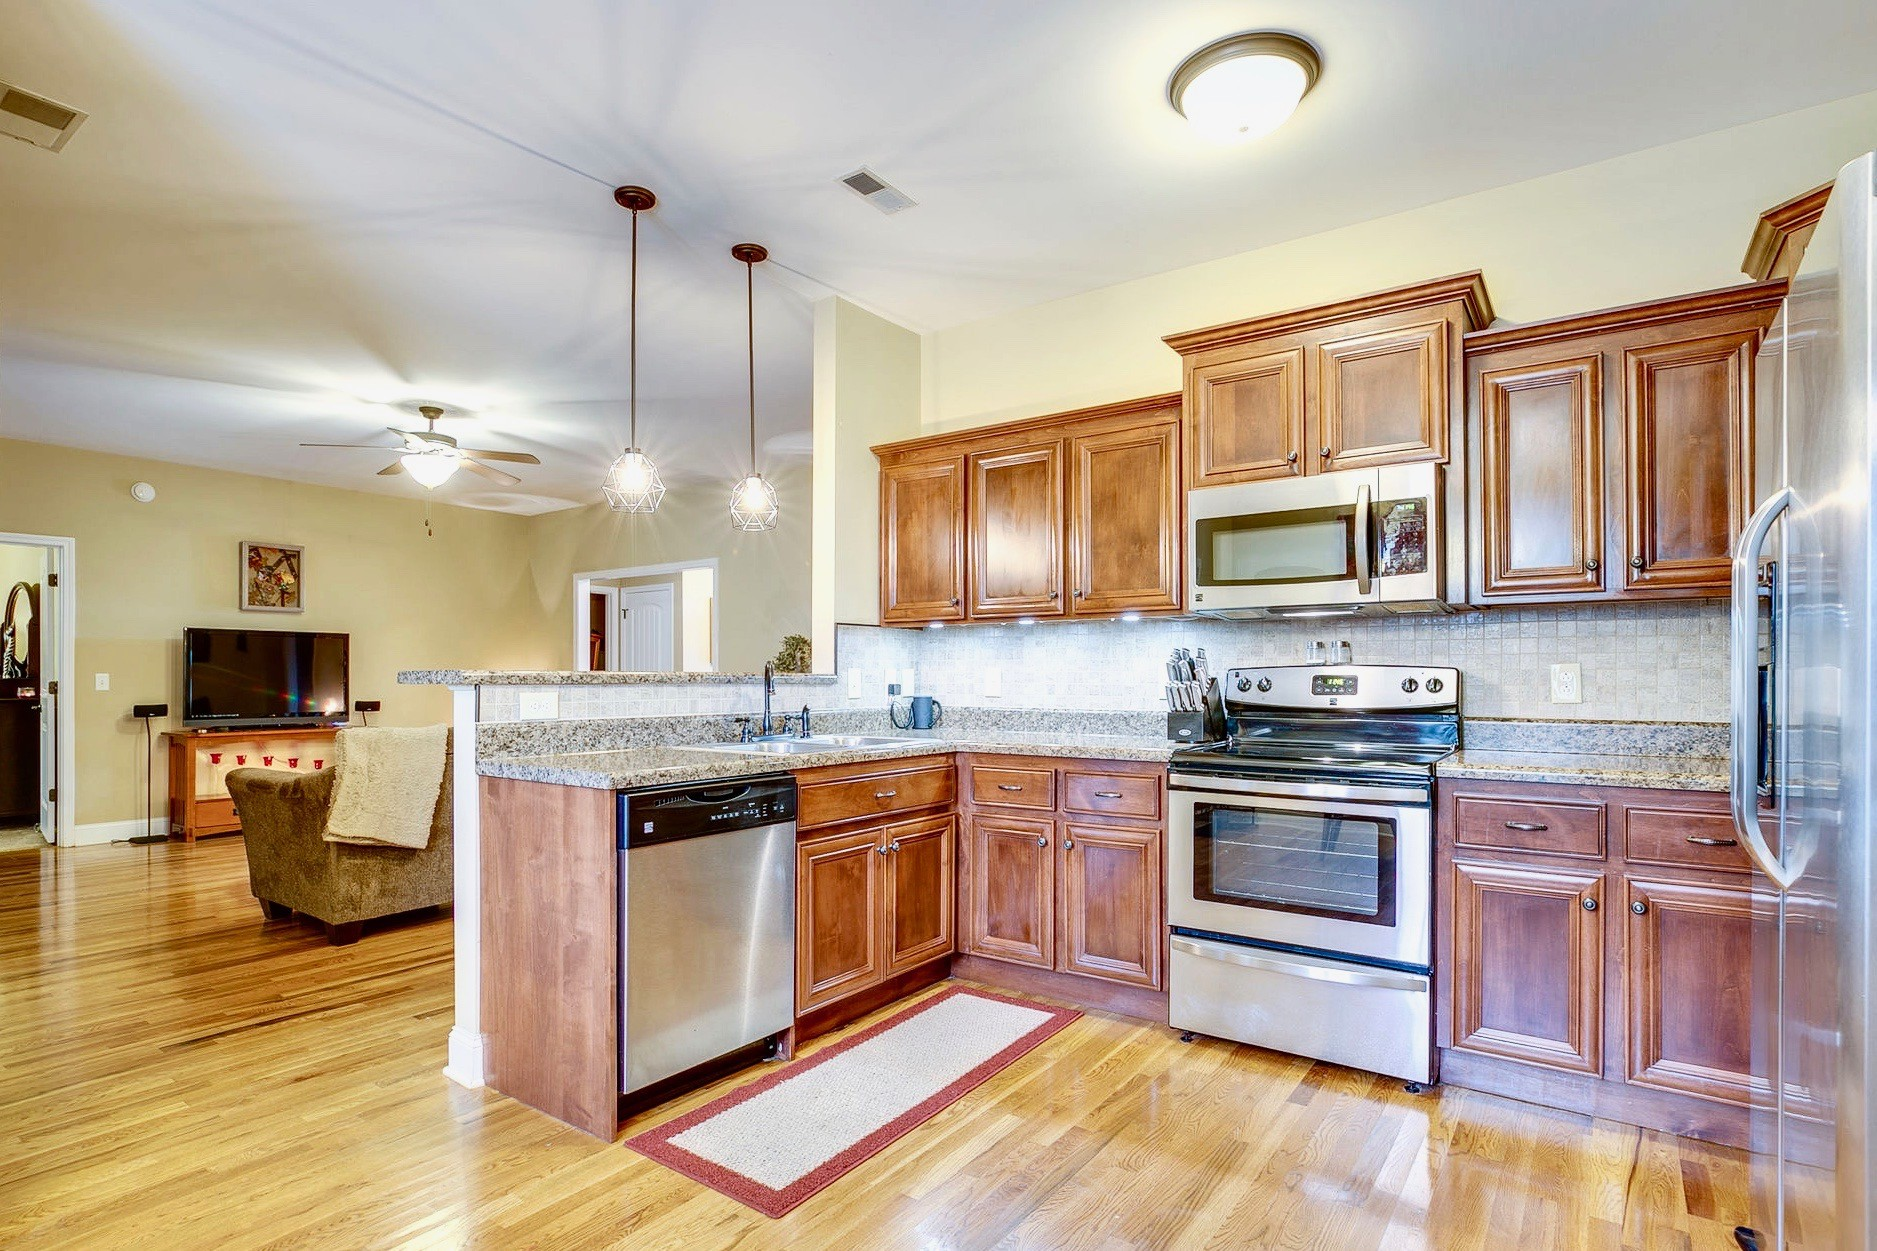 8023 Dave Way, Smyrna, TN 37167 - Smyrna, TN real estate listing